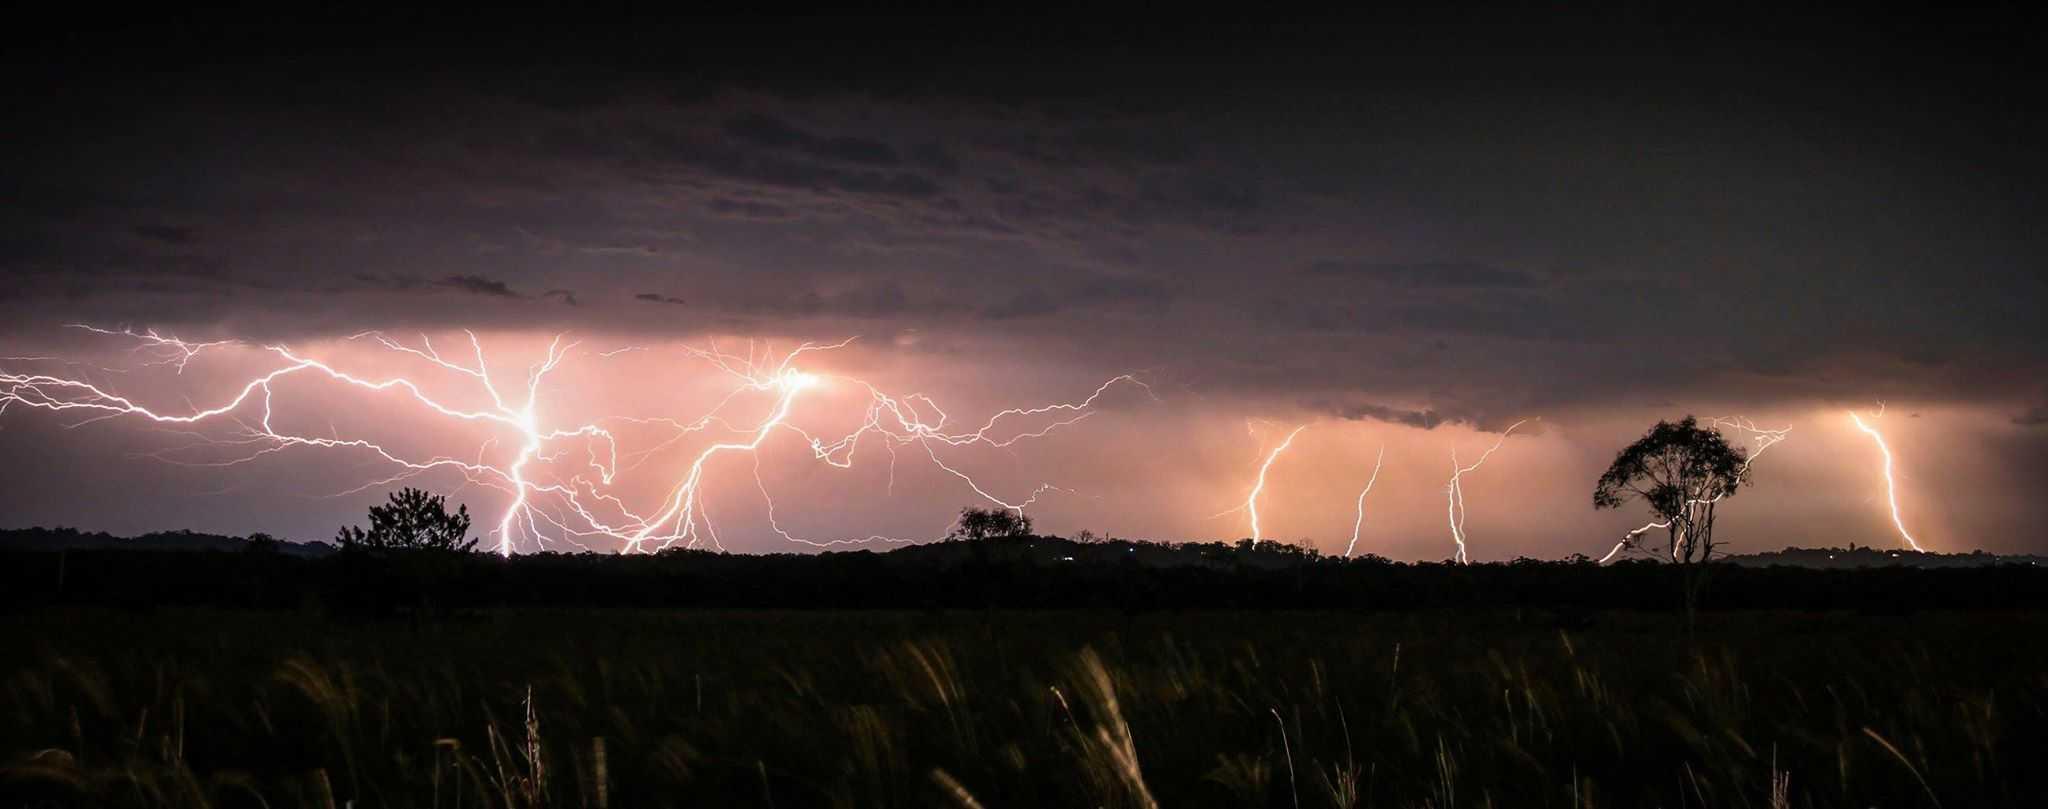 Storm from January 2014 taken from Meridan Plains Australia.